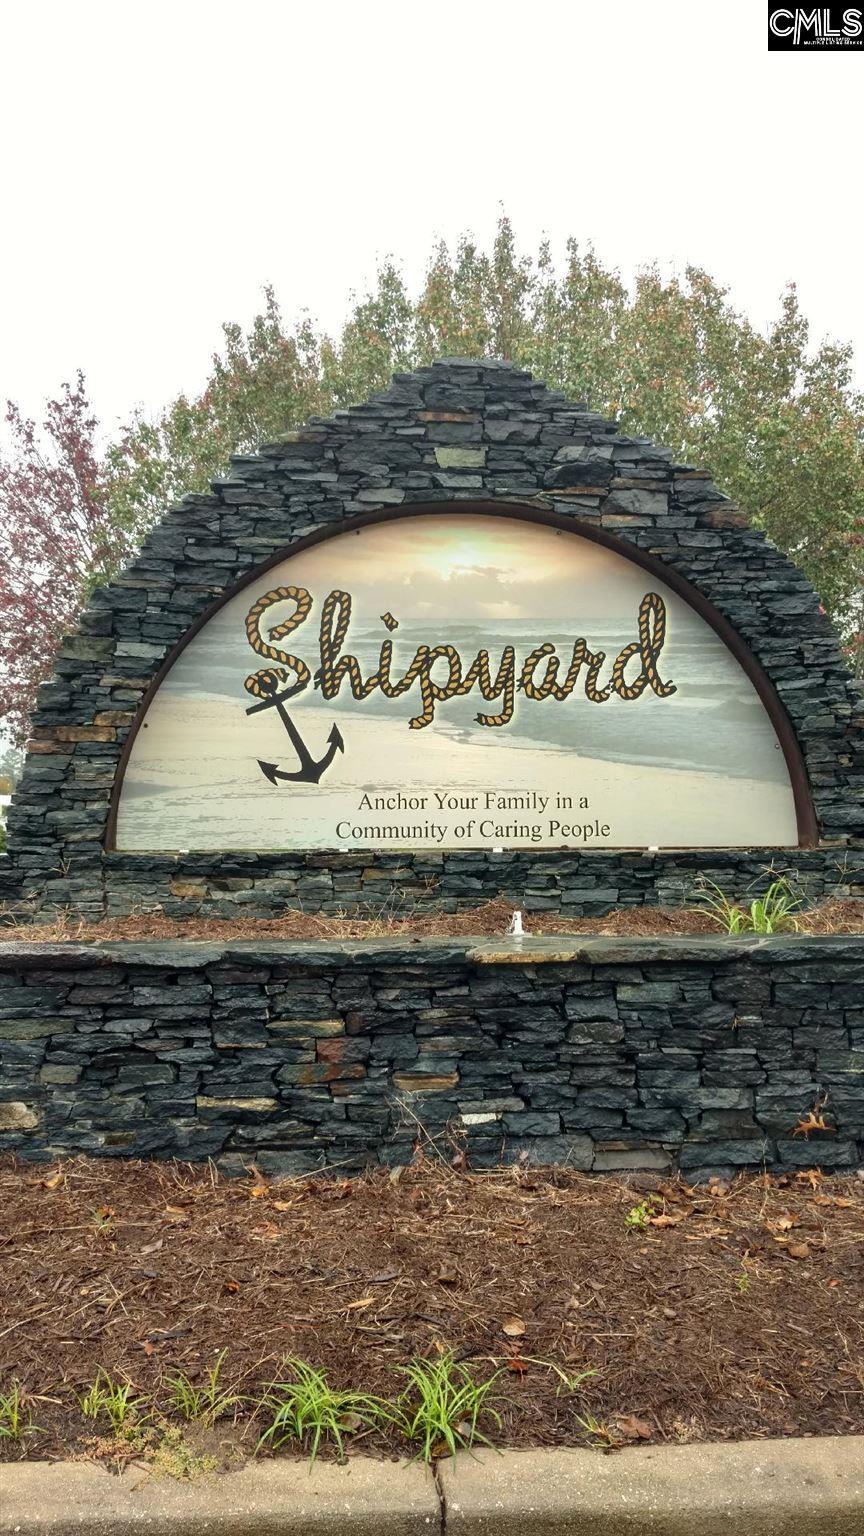 128 Shipyard Chapin, SC 29036